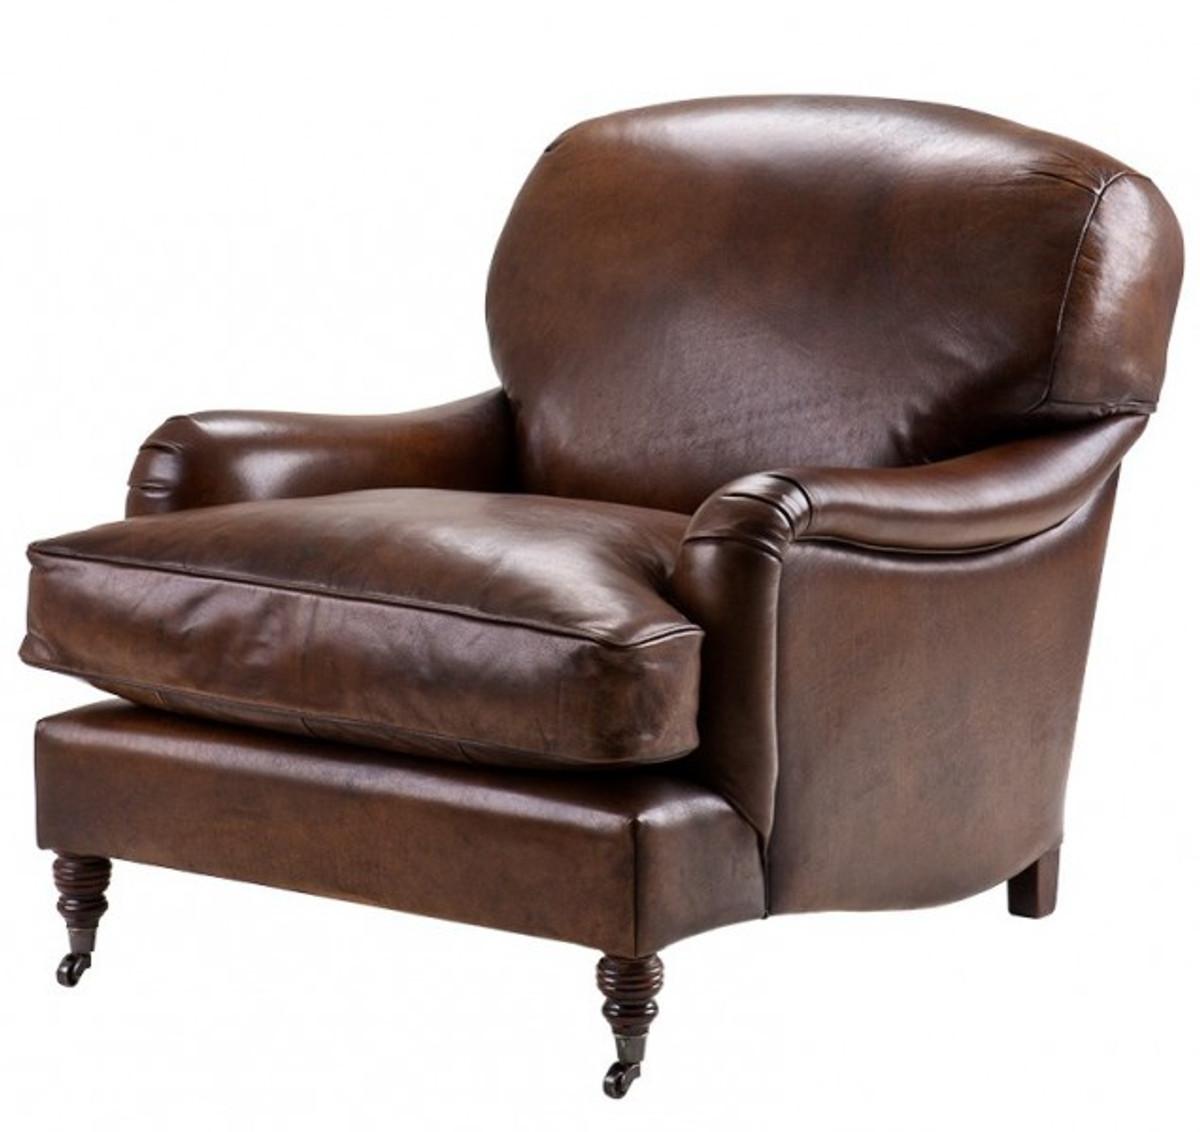 chesterfield luxus echt leder ohrensessel vintage leder dunkelbraun von casa padrino club. Black Bedroom Furniture Sets. Home Design Ideas